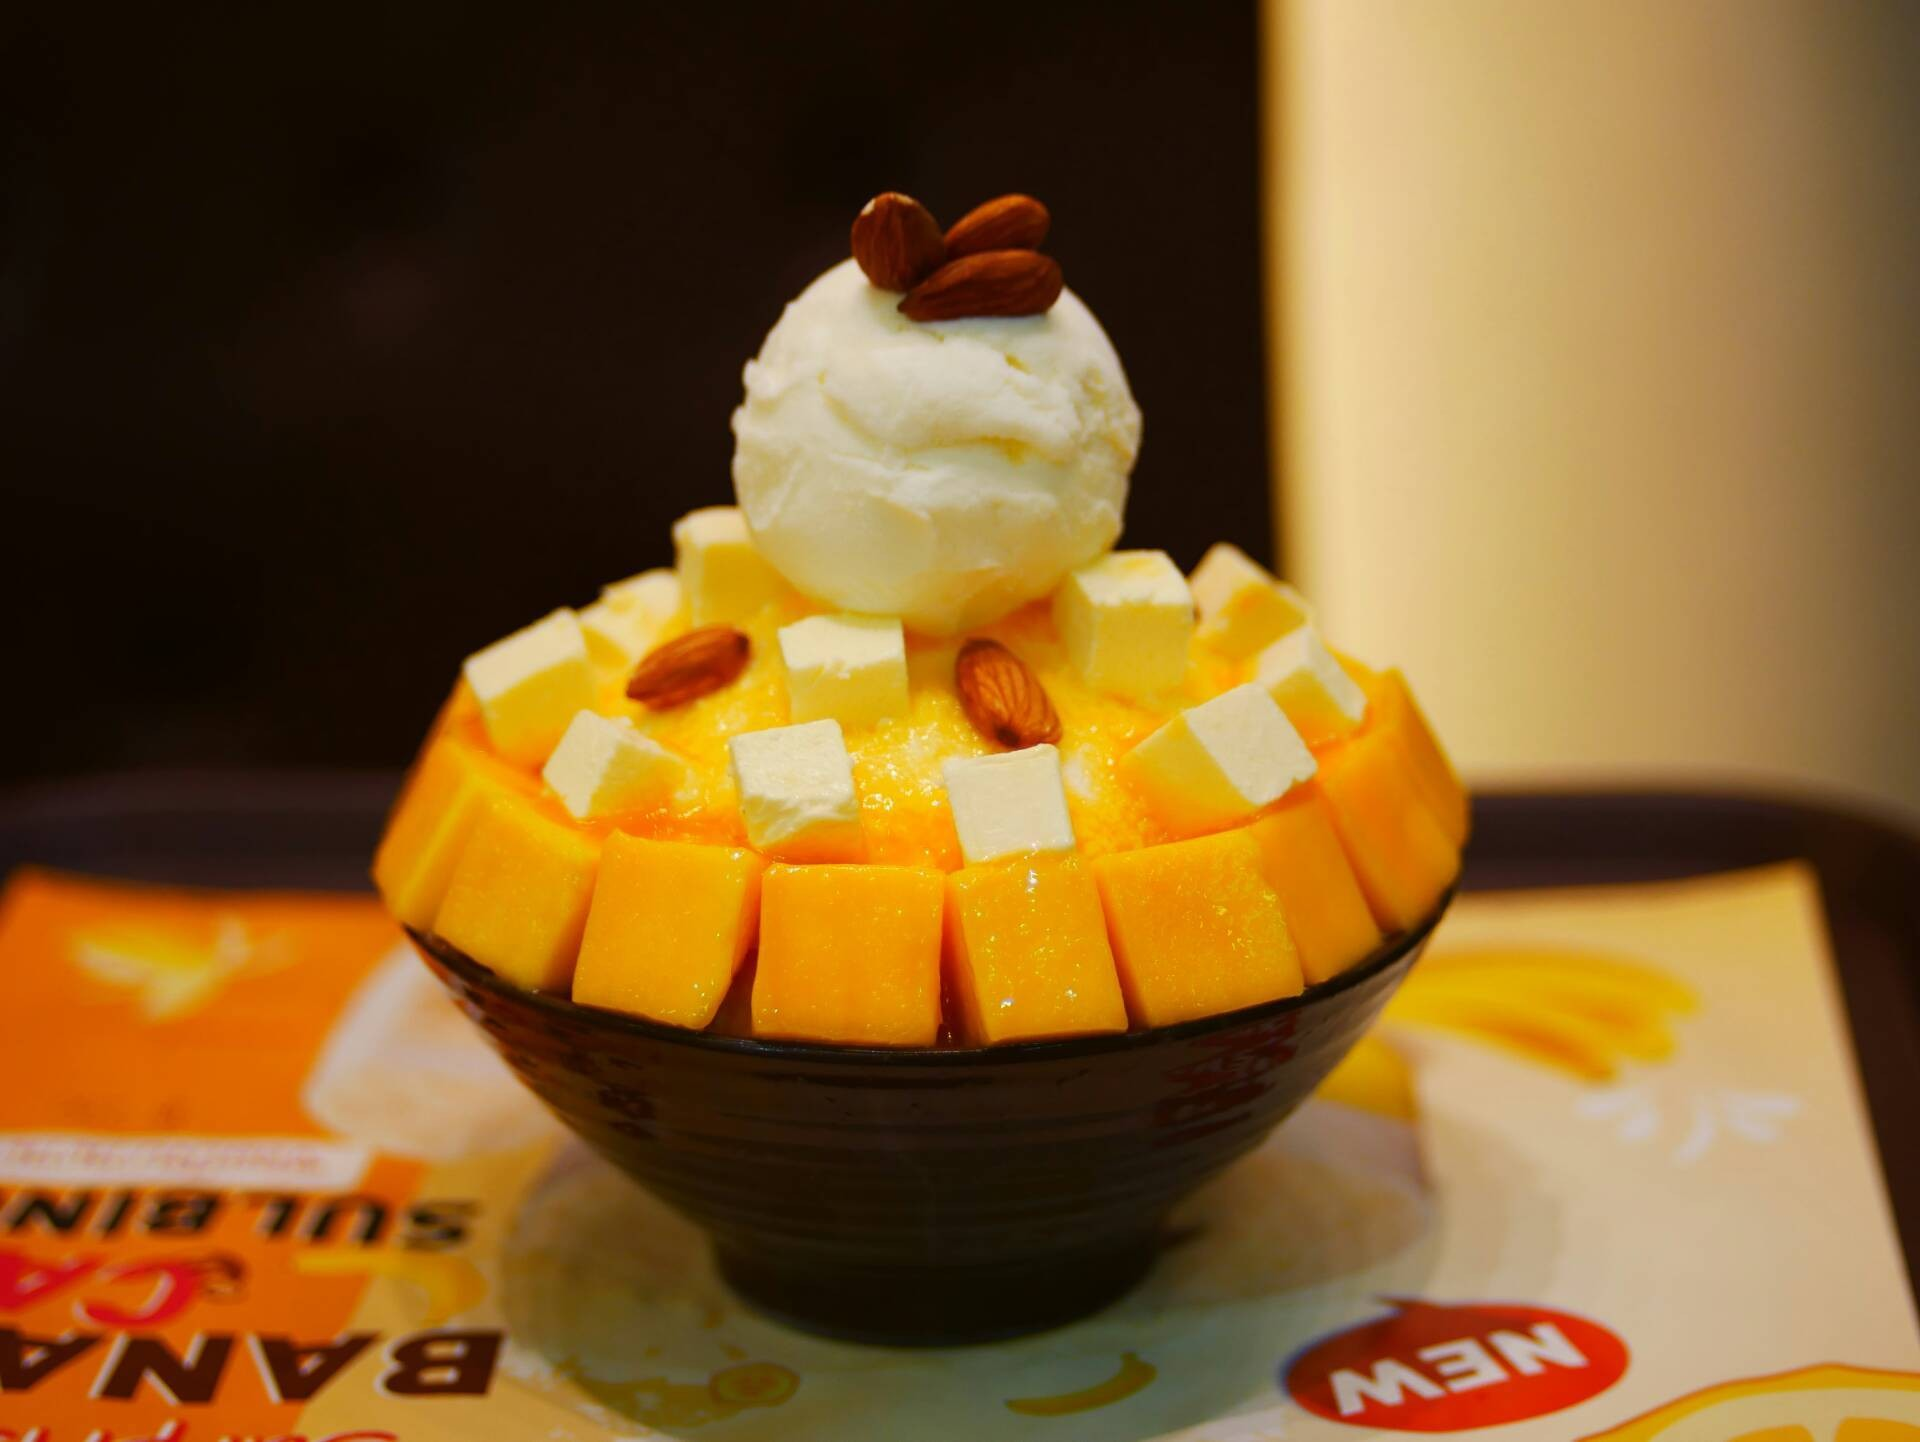 Sulbing Korean Dessert Cafe สยามสแควร์ ซอย 2